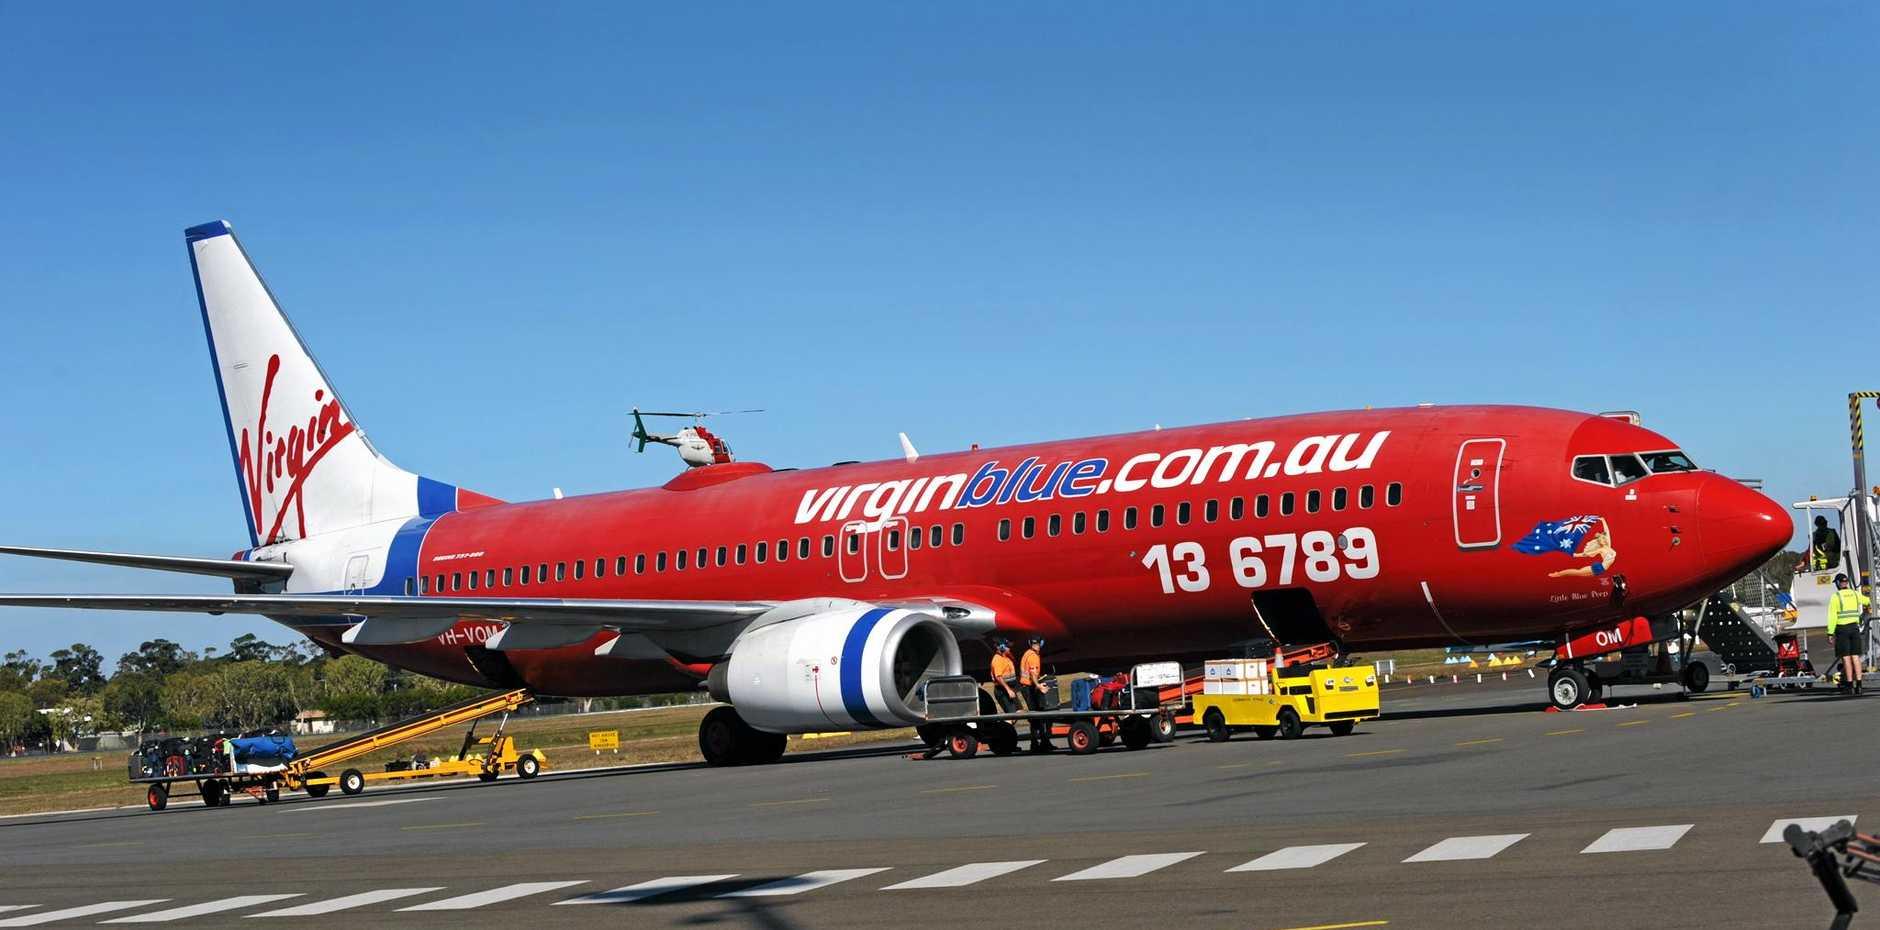 Aeroplanes on the runway at Sunshine Coast Airport, Virgin Australia plane. Photo: Iain Curry / Sunshine Coast Daily